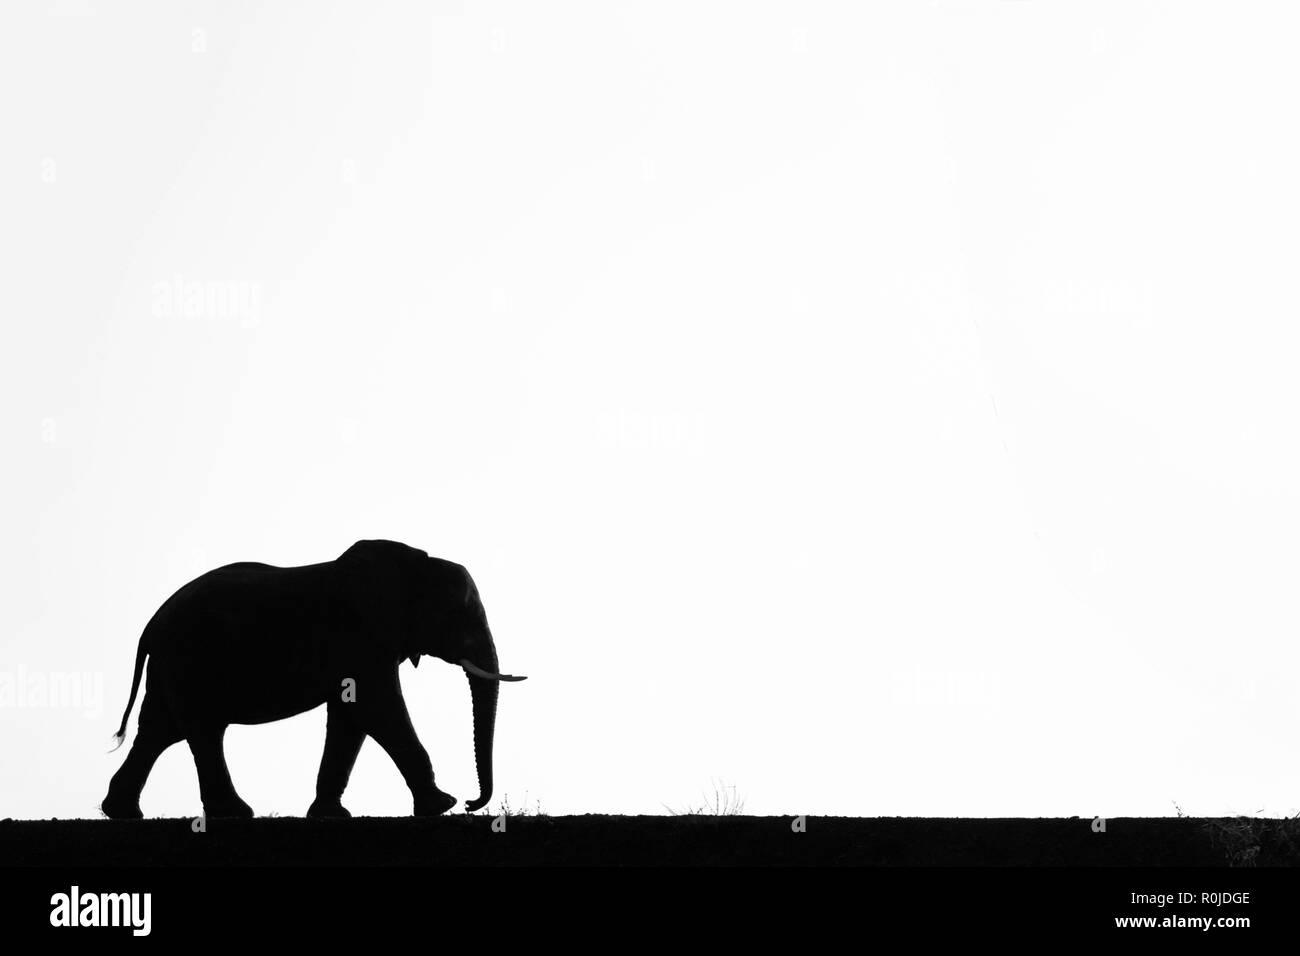 Elephant (Loxodonta africana) silhouette, Zimanga private game reserve, KwaZulu-Natal, South Africa Stock Photo